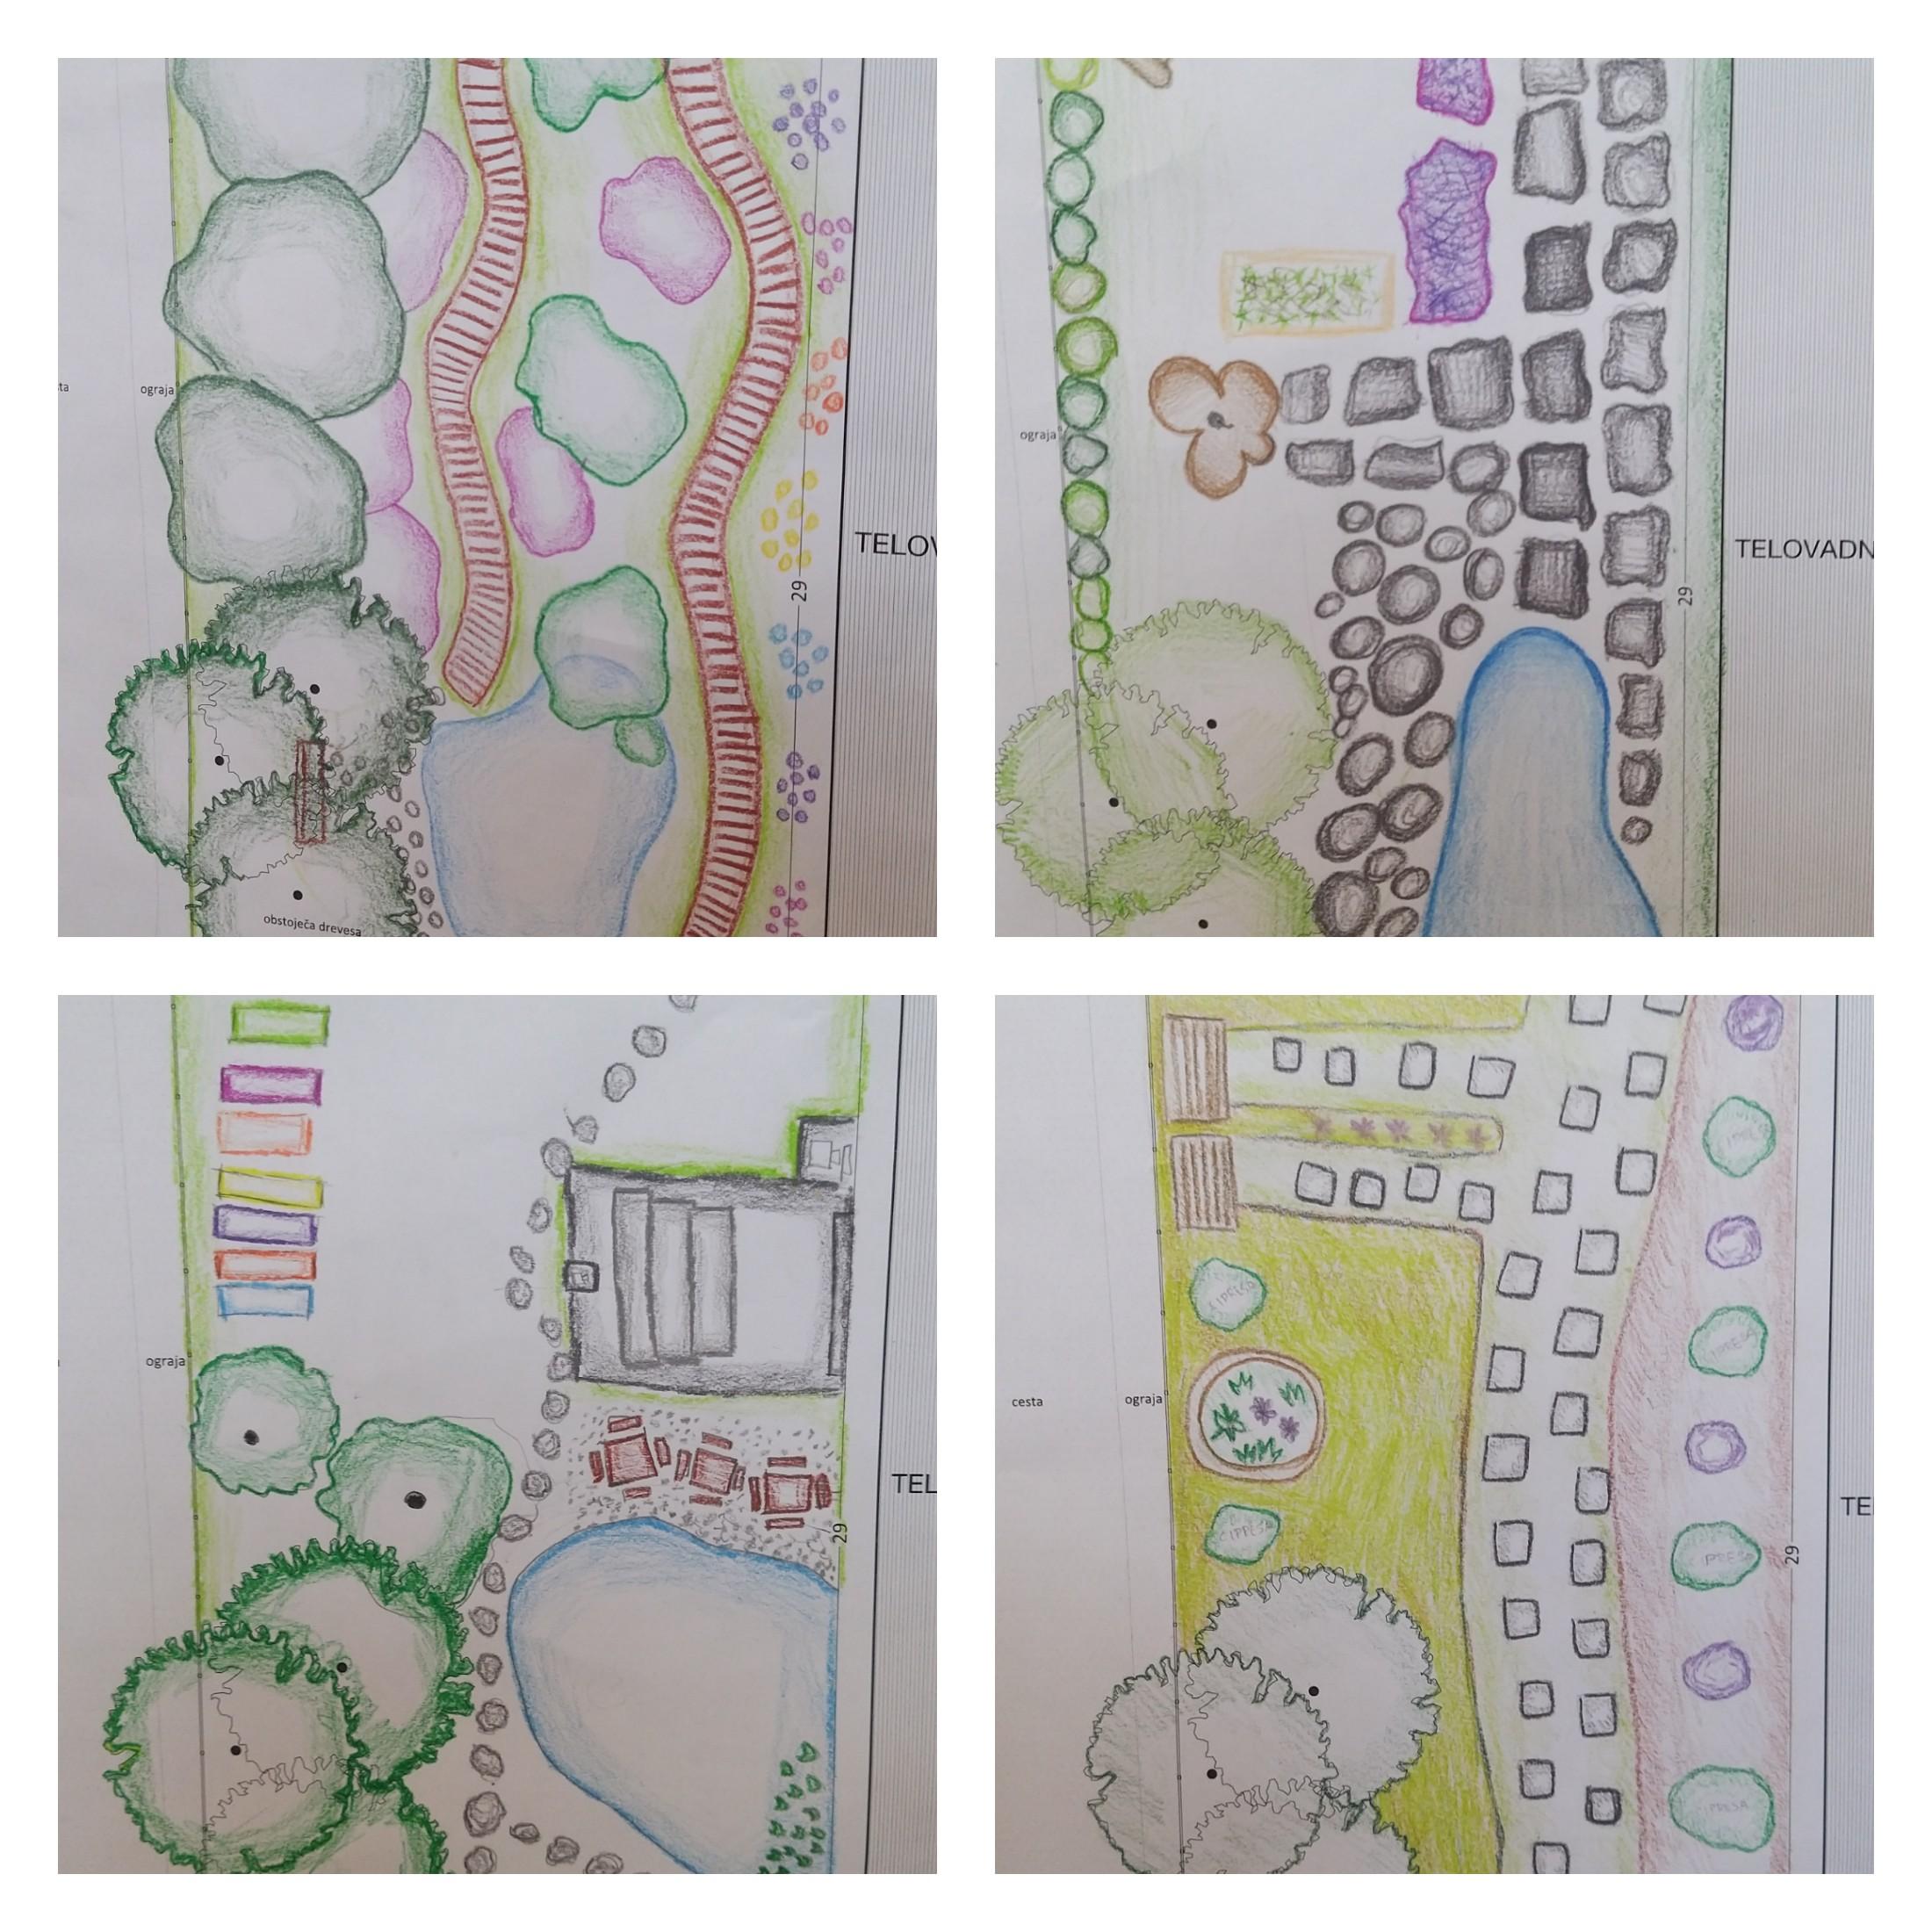 students-garden-area-sketches-_1-1